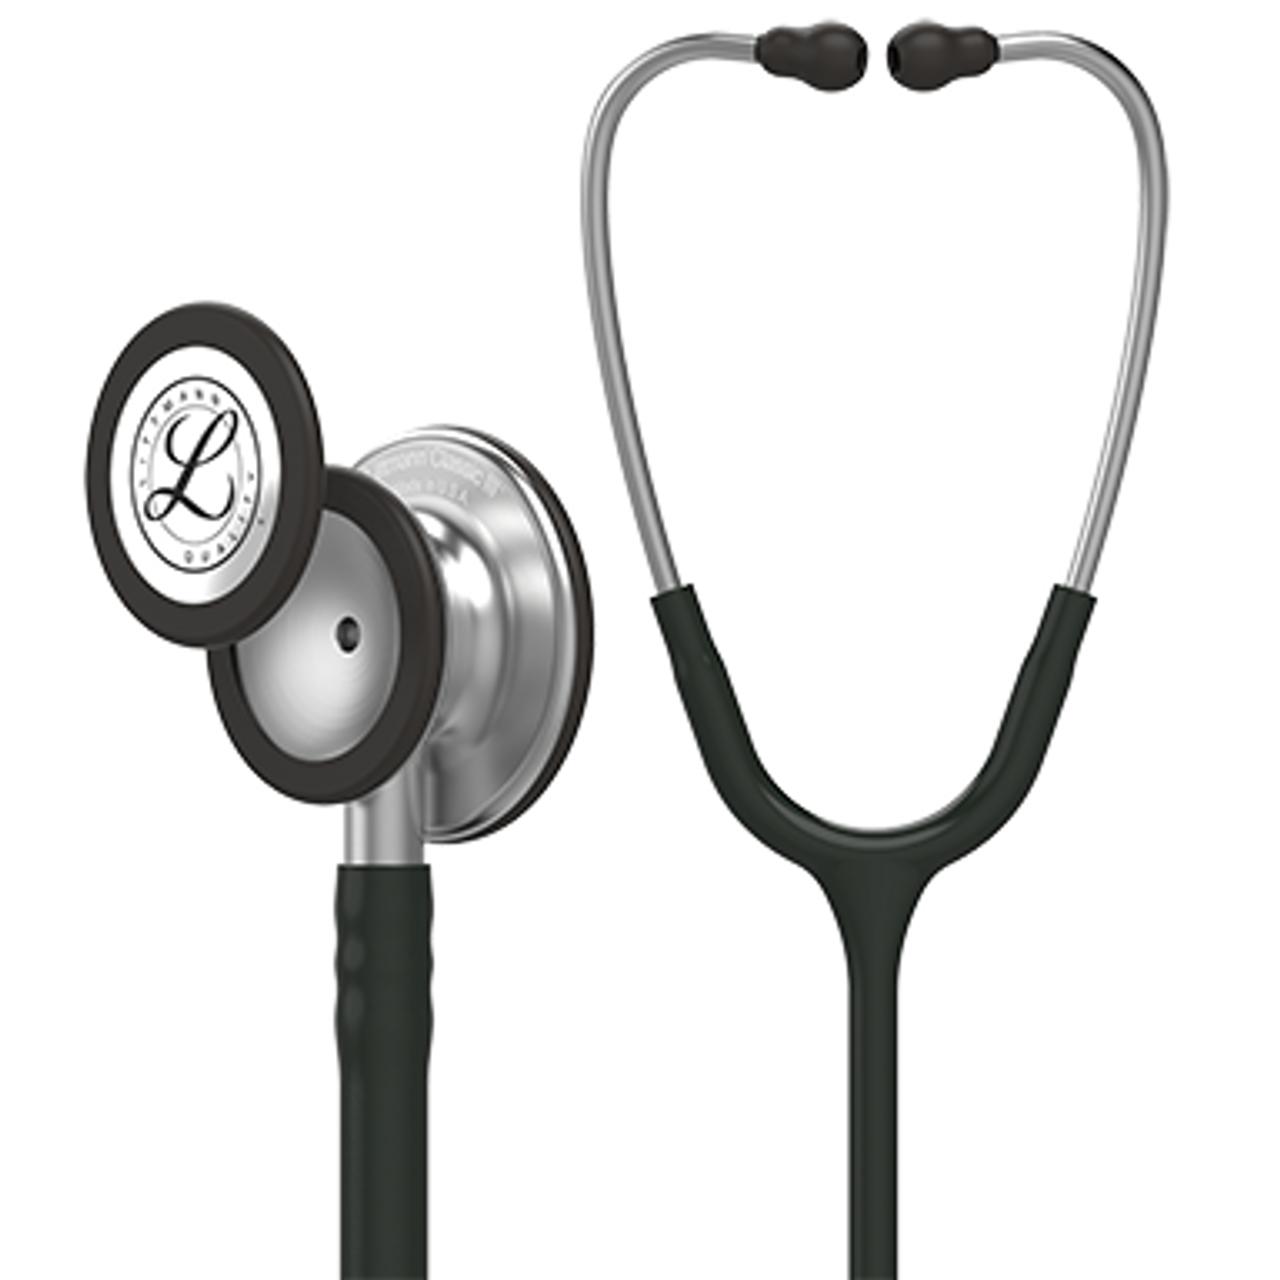 Littmann Classic III Stethoscope, Black, 5620